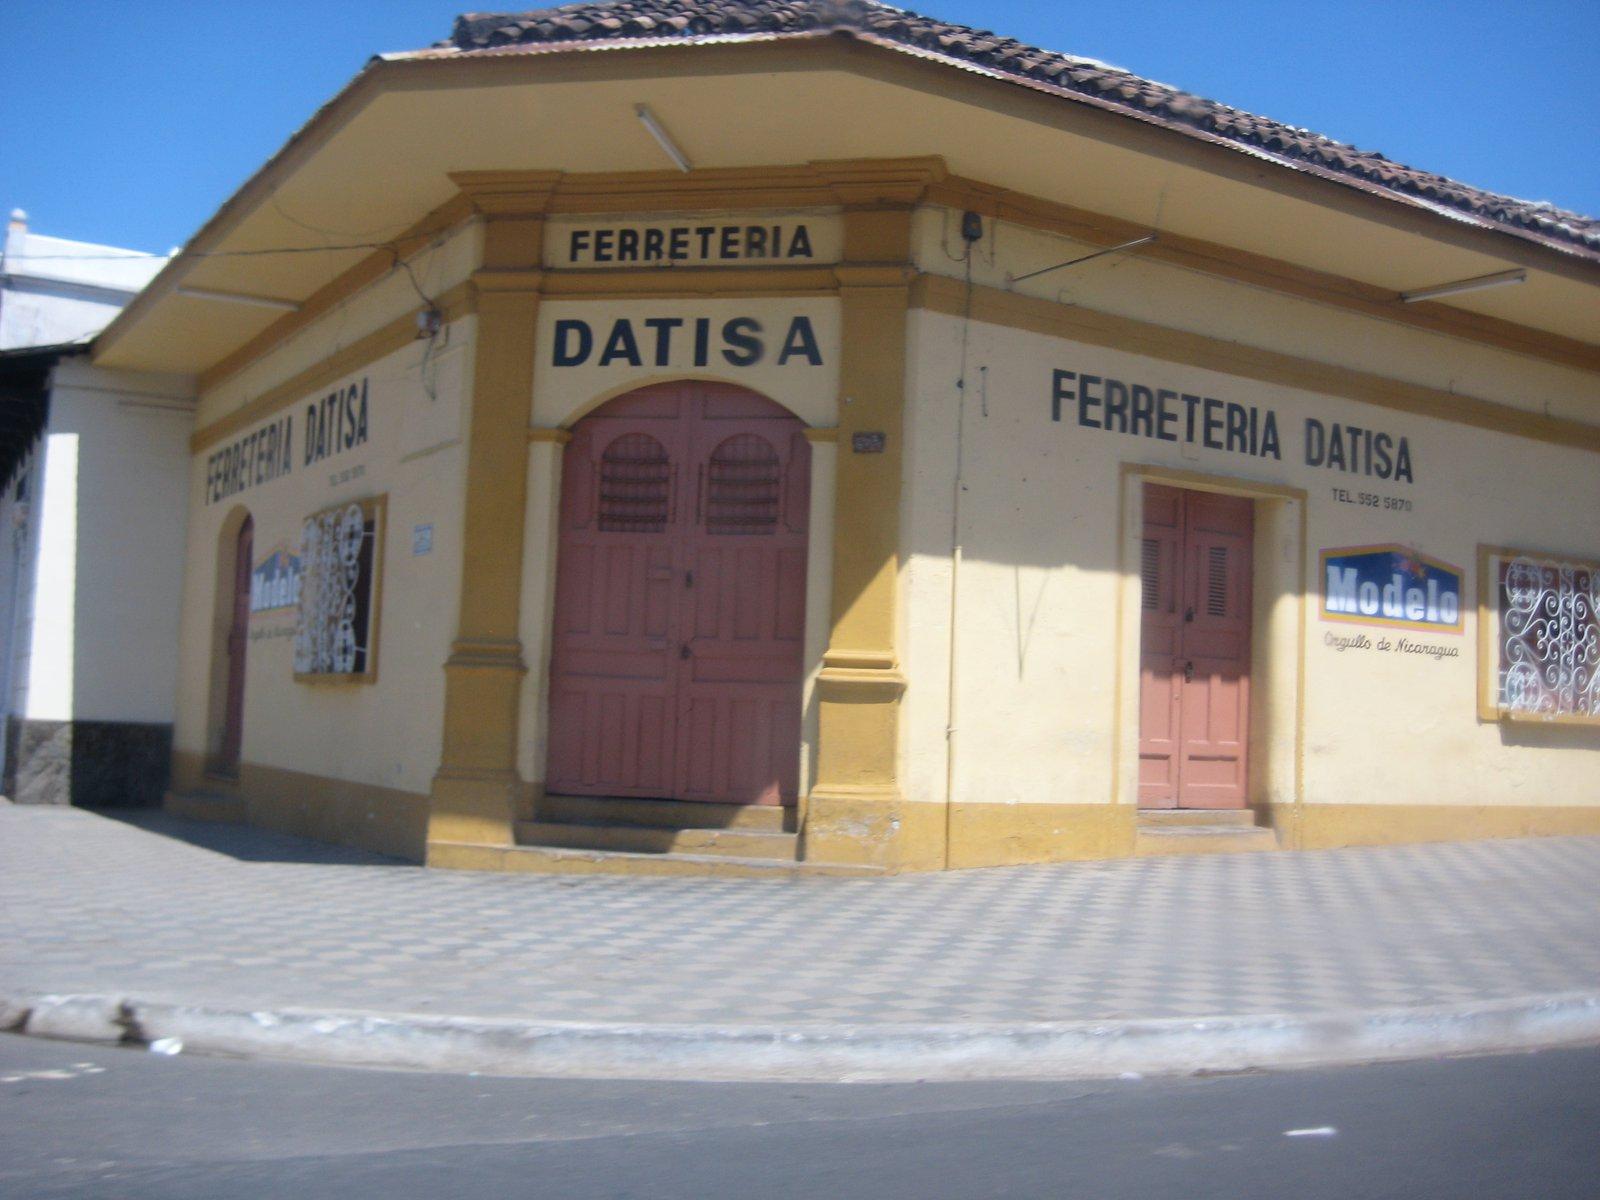 City of Grenada in Nicaragua